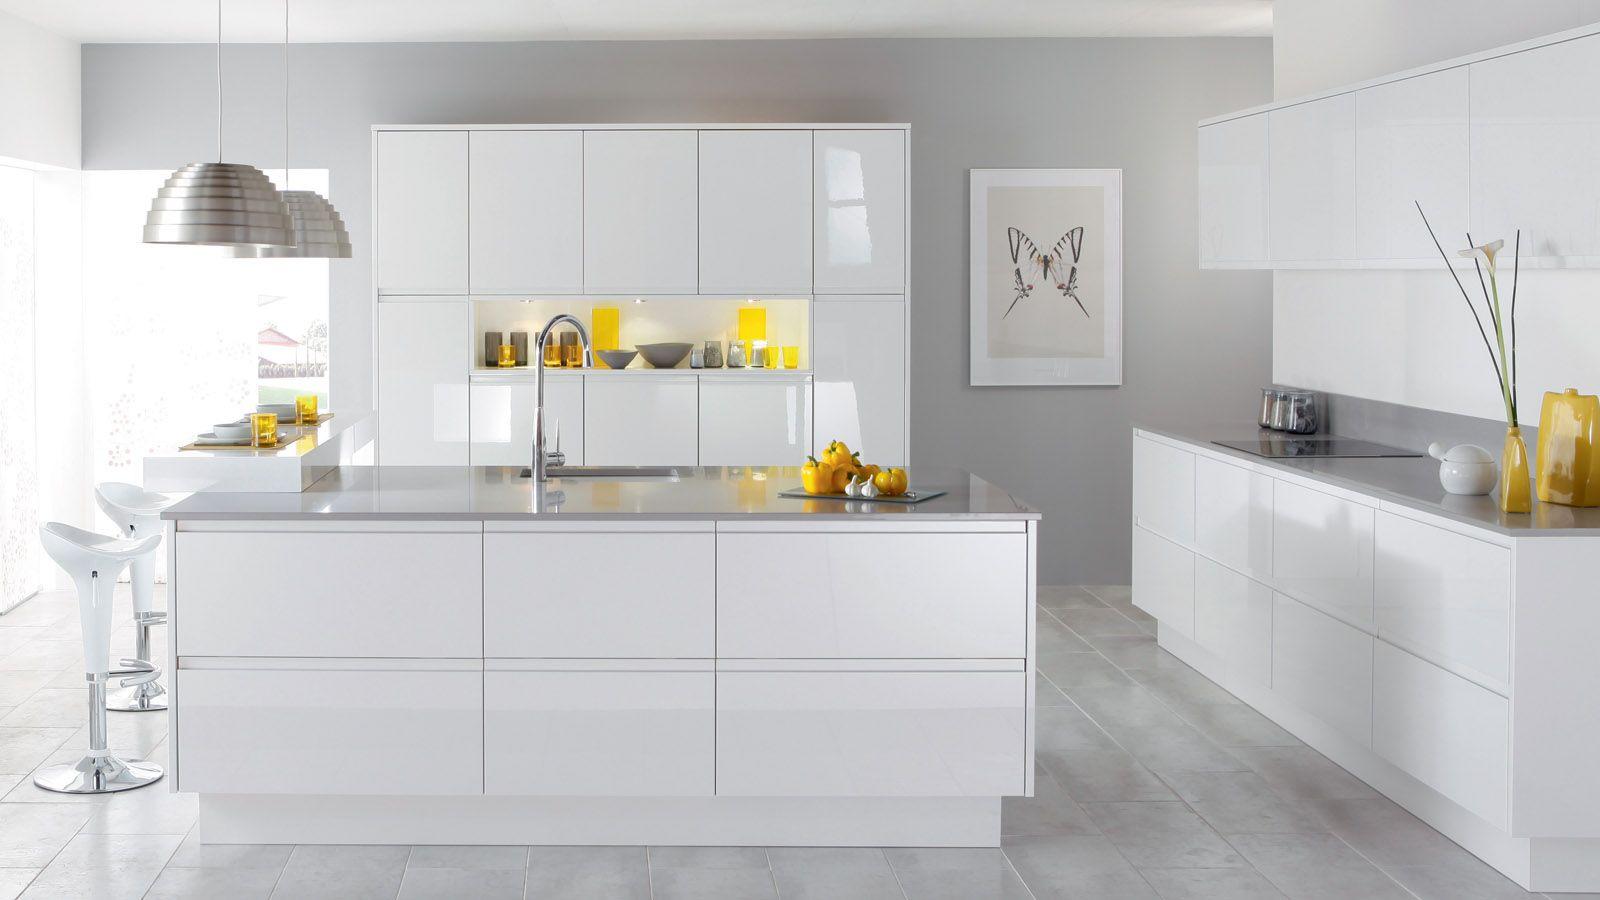 Handleless Gloss White Kitchen Modern Look Great For A Studio Flat Where Kitchen Is Open White Modern Kitchen Contemporary Kitchen Design White Gloss Kitchen